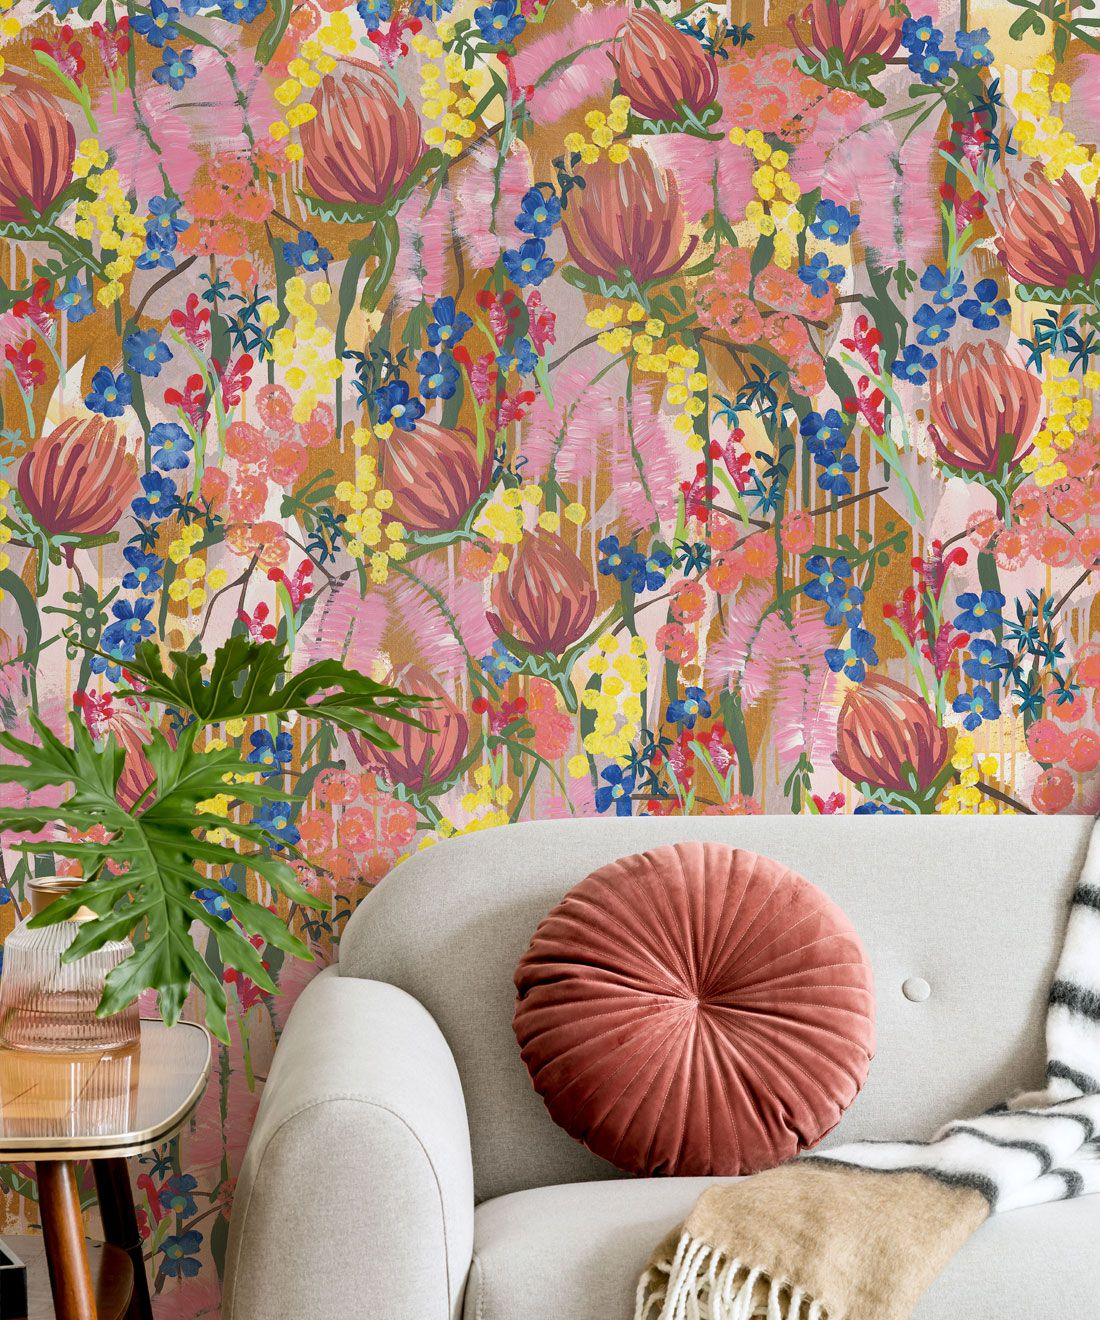 Acacia Wallpaper •Colourful Floral Wallpaper • Tiff Manuell • Abstract Expressionist Wallpaper • Close Up Insitu